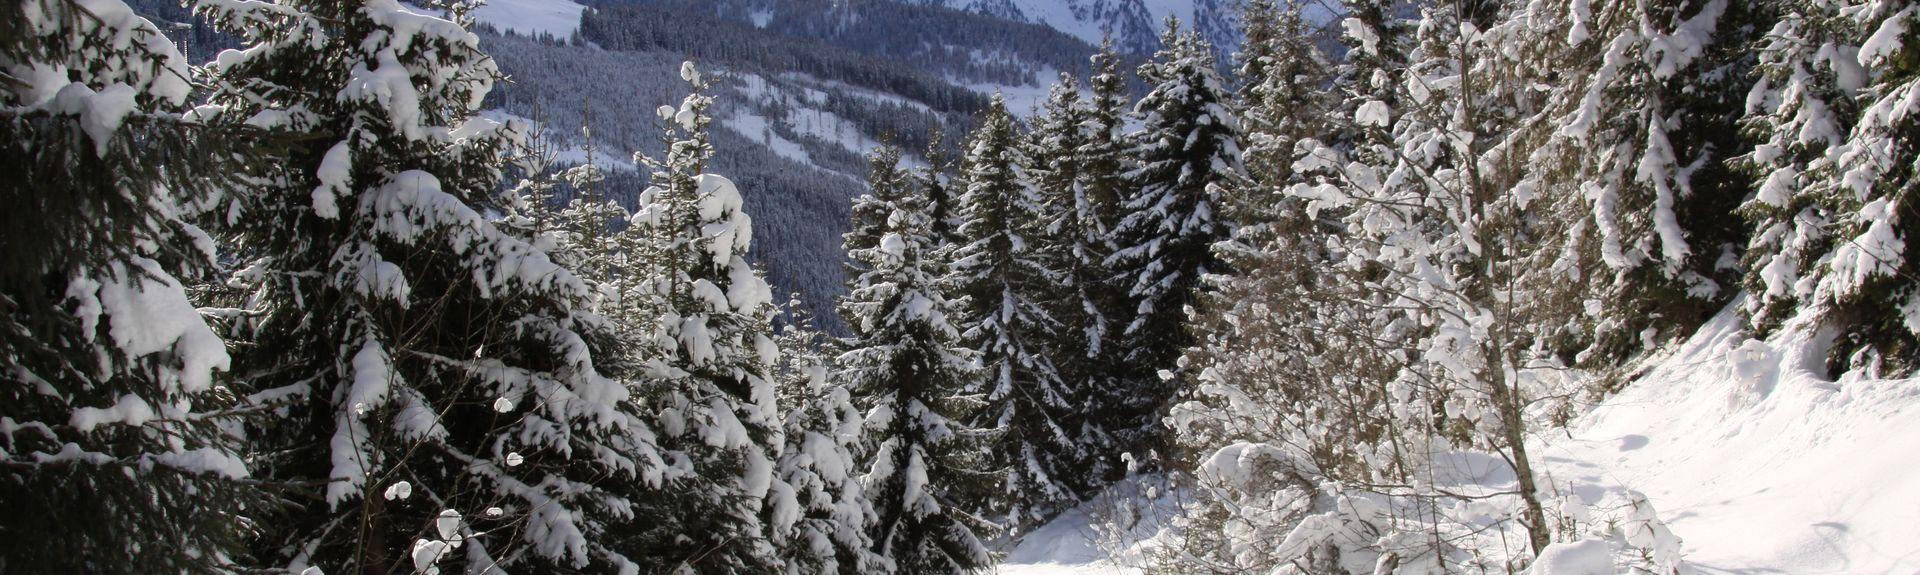 Hollersbach im Pinzgau, Austria